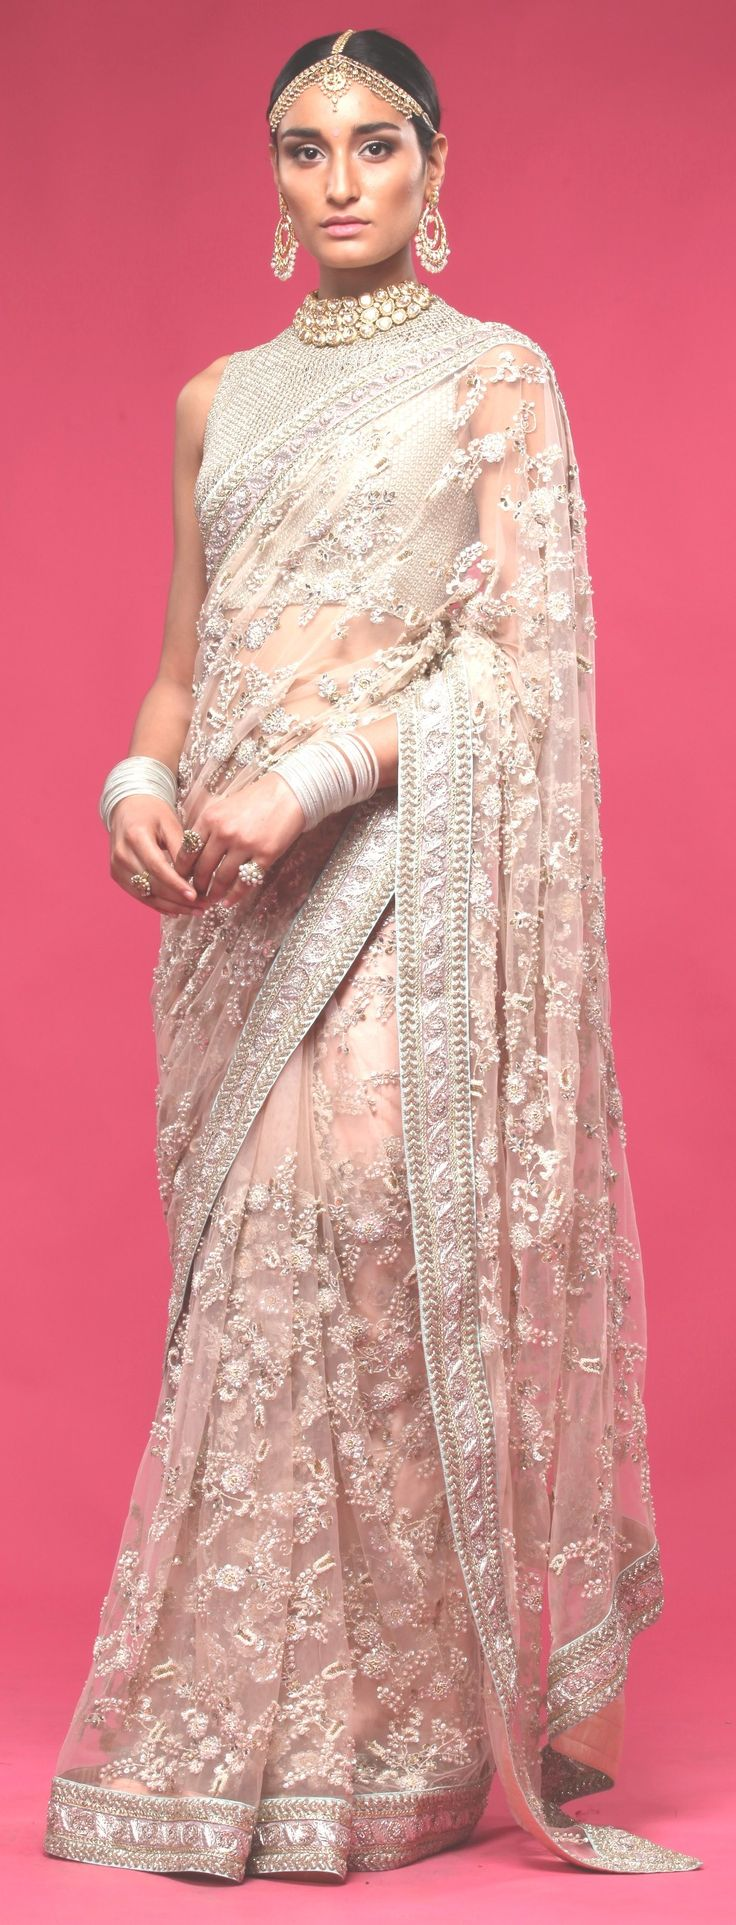 1146 mejores imágenes de Pastels nd Shimmer en Pinterest | Vestidos ...